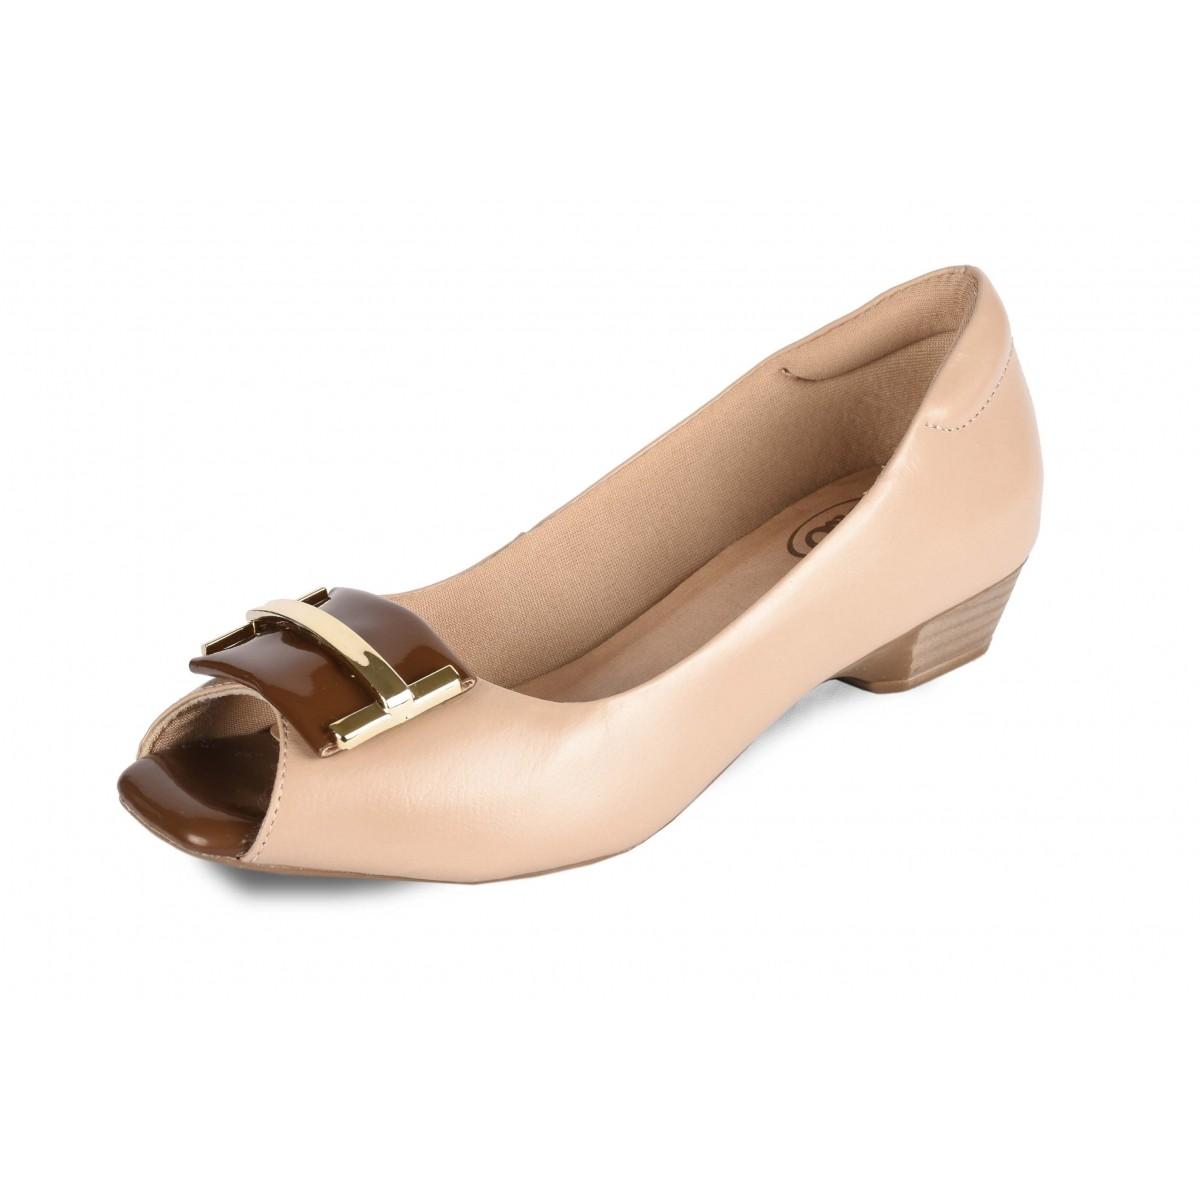 Sapato Neftali Comfort, peep-toe, cappuccino com fivela